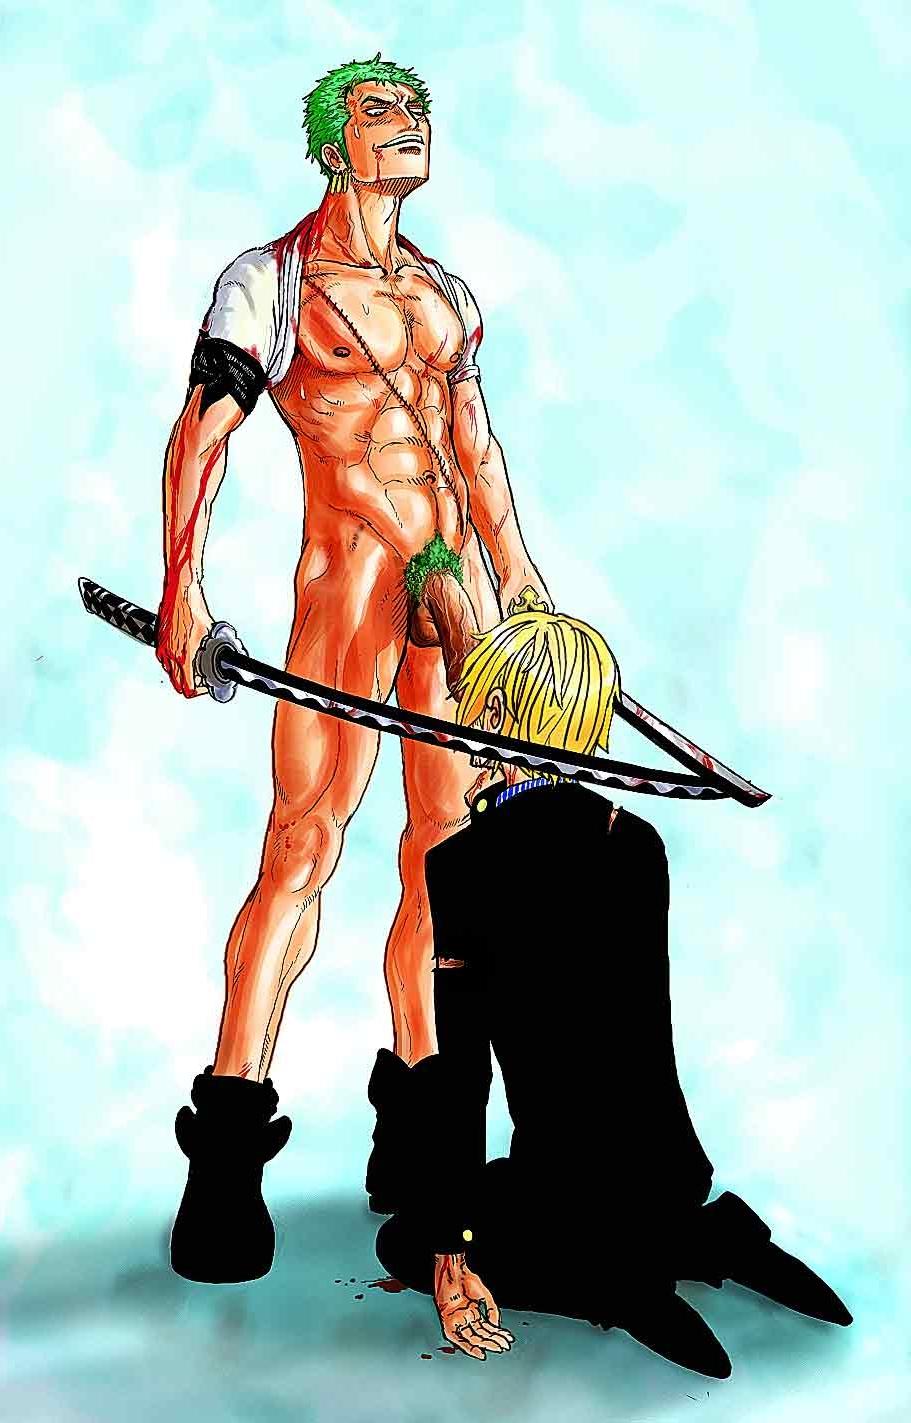 Toon sex pic ##000130308399 male one piece roronoa zoro sanji yaoi